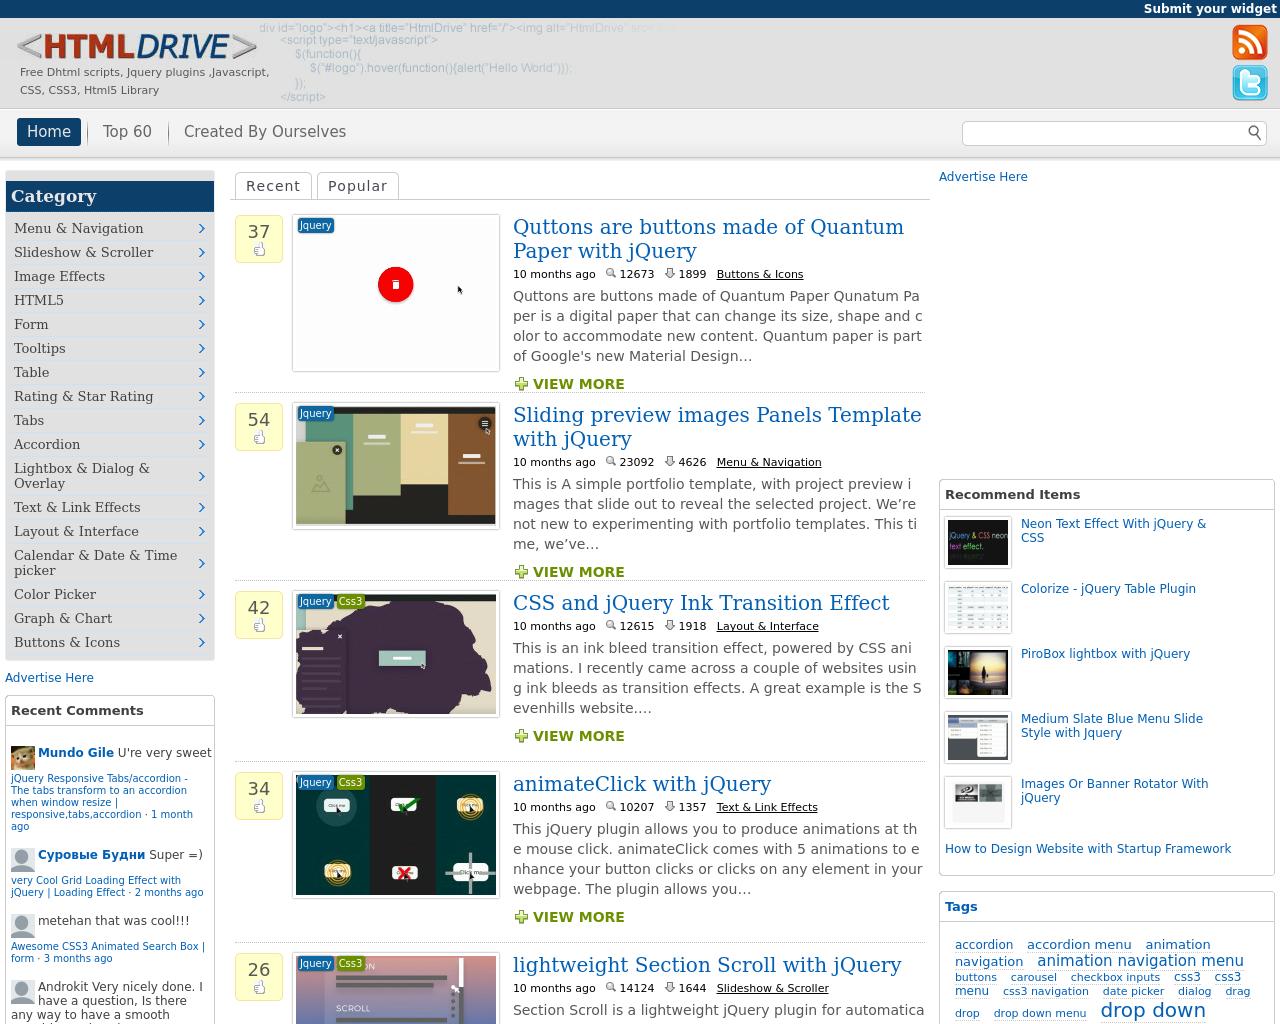 HtmlDrive-Advertising-Reviews-Pricing